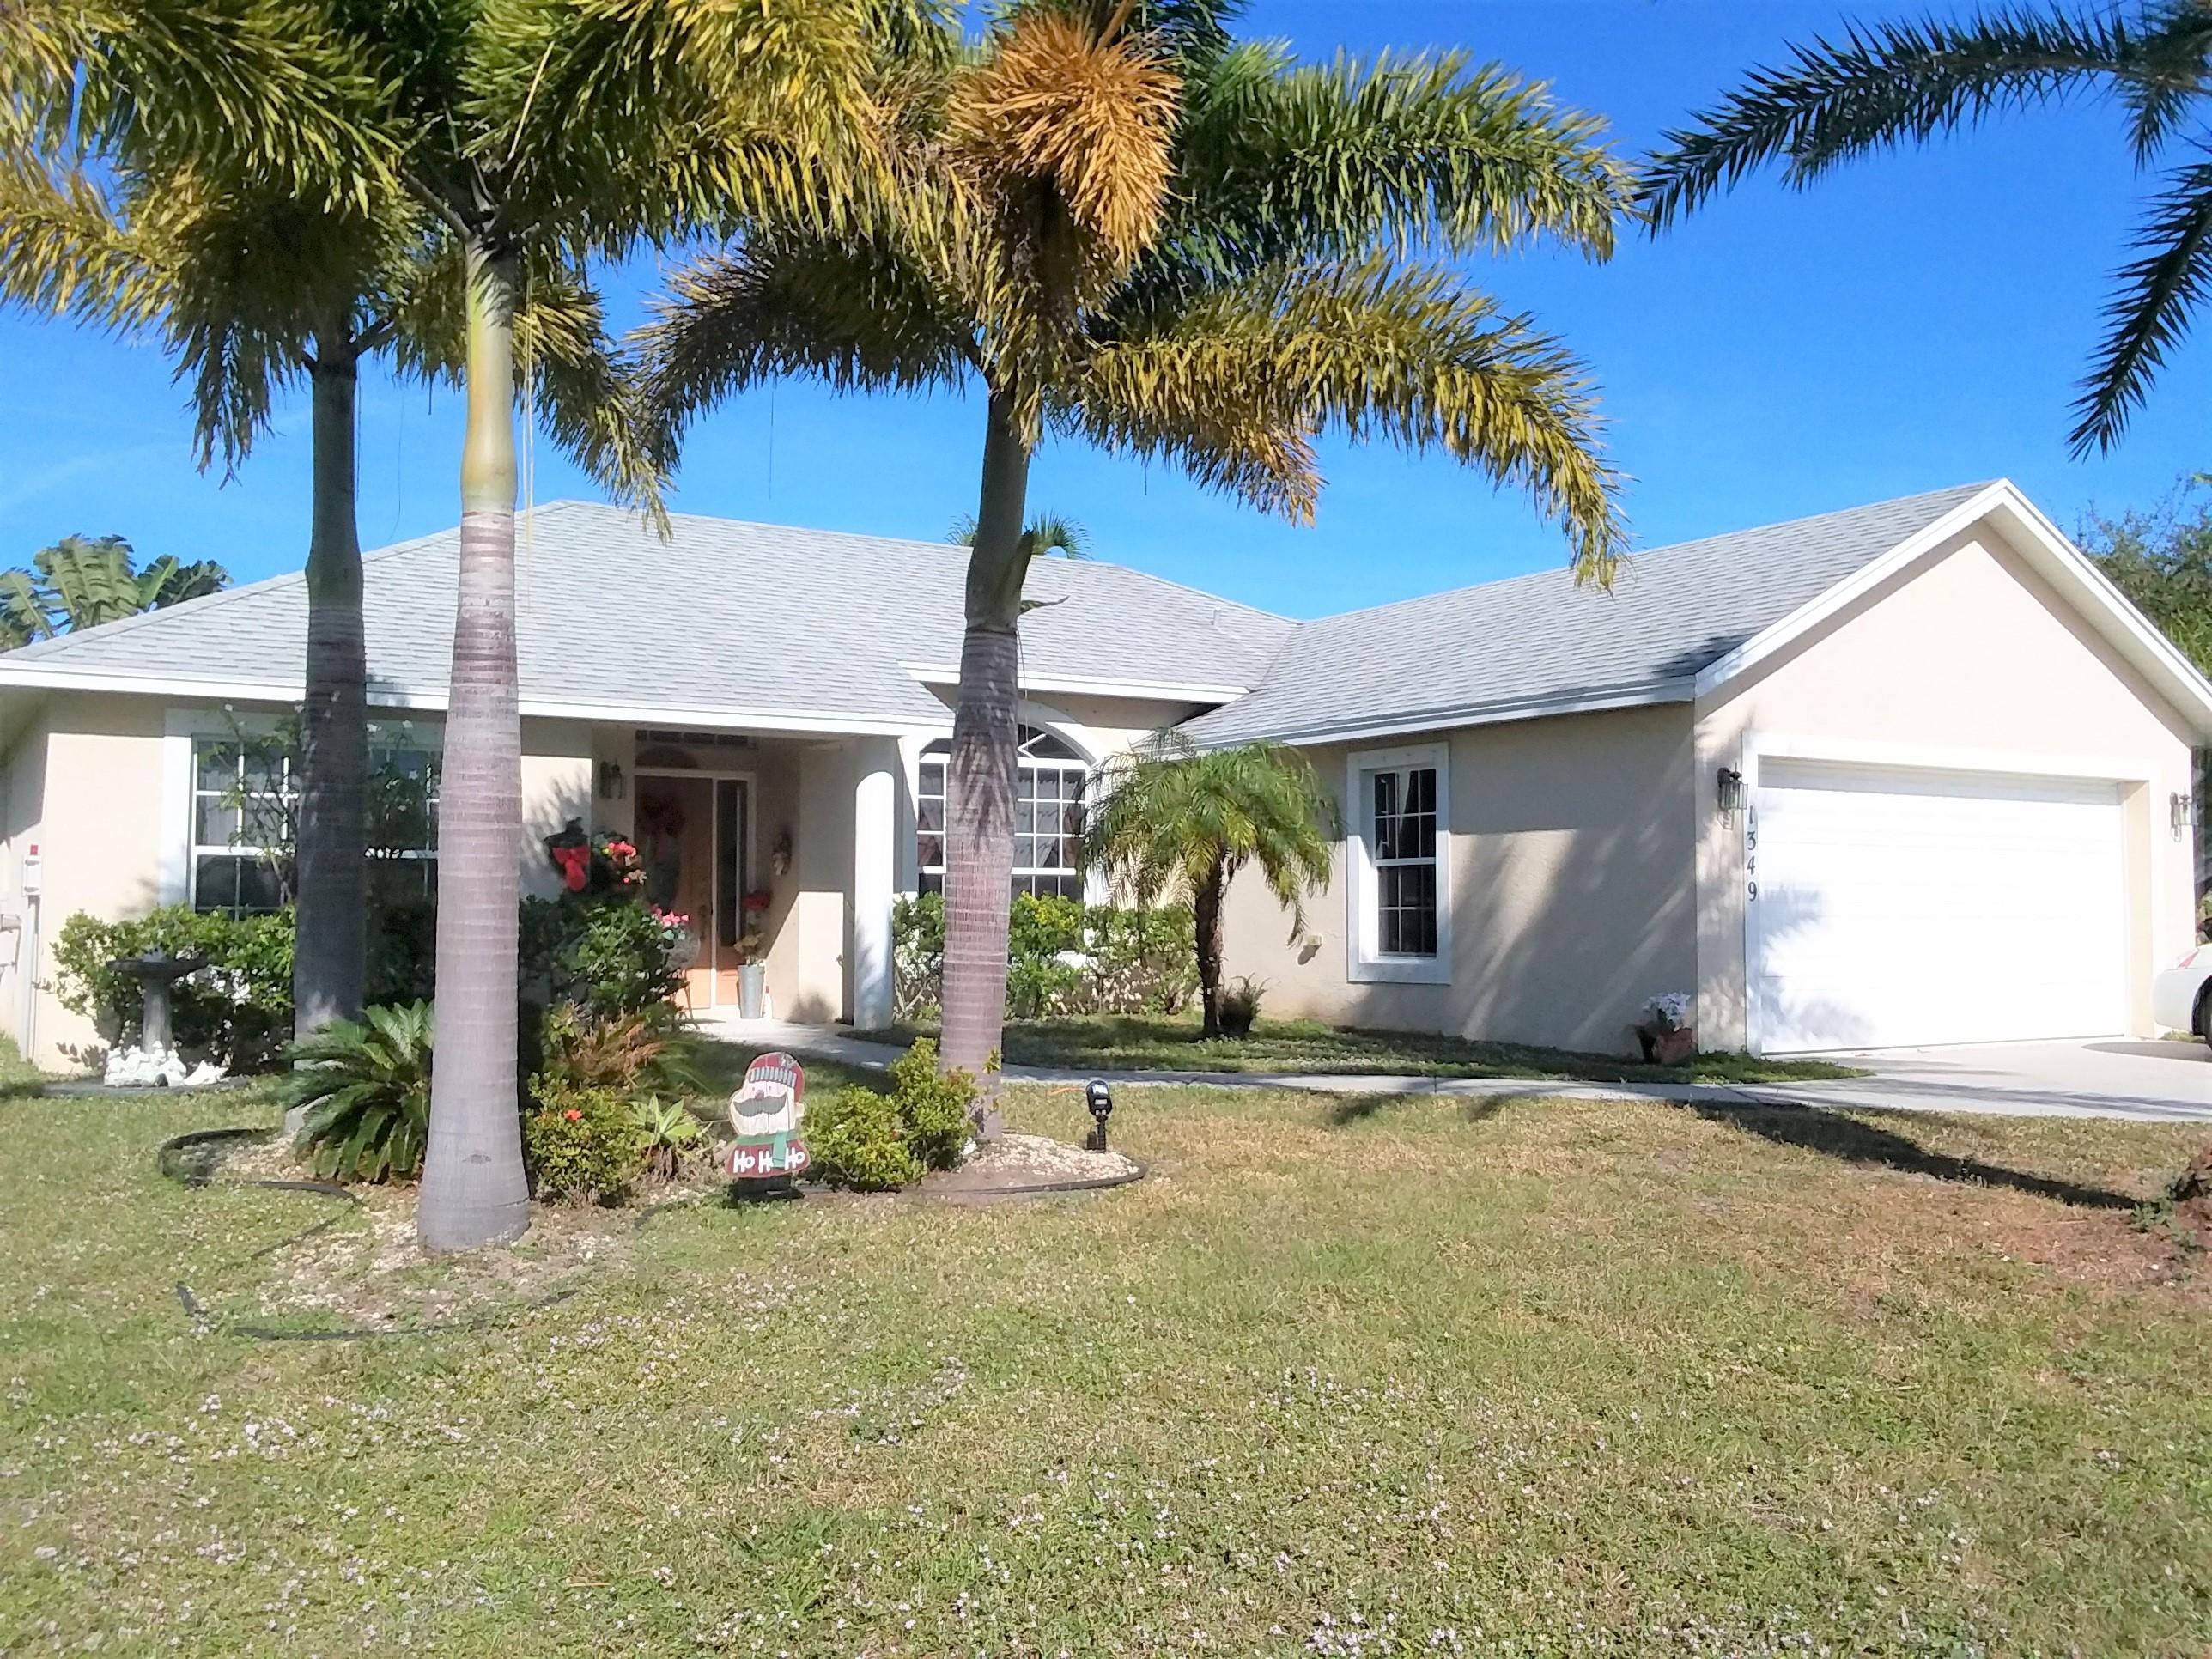 1349 Appamattox Terrace, Port Saint Lucie, Florida 34953, 3 Bedrooms Bedrooms, ,2 BathroomsBathrooms,Single Family,For Sale,Appamattox,RX-10499020